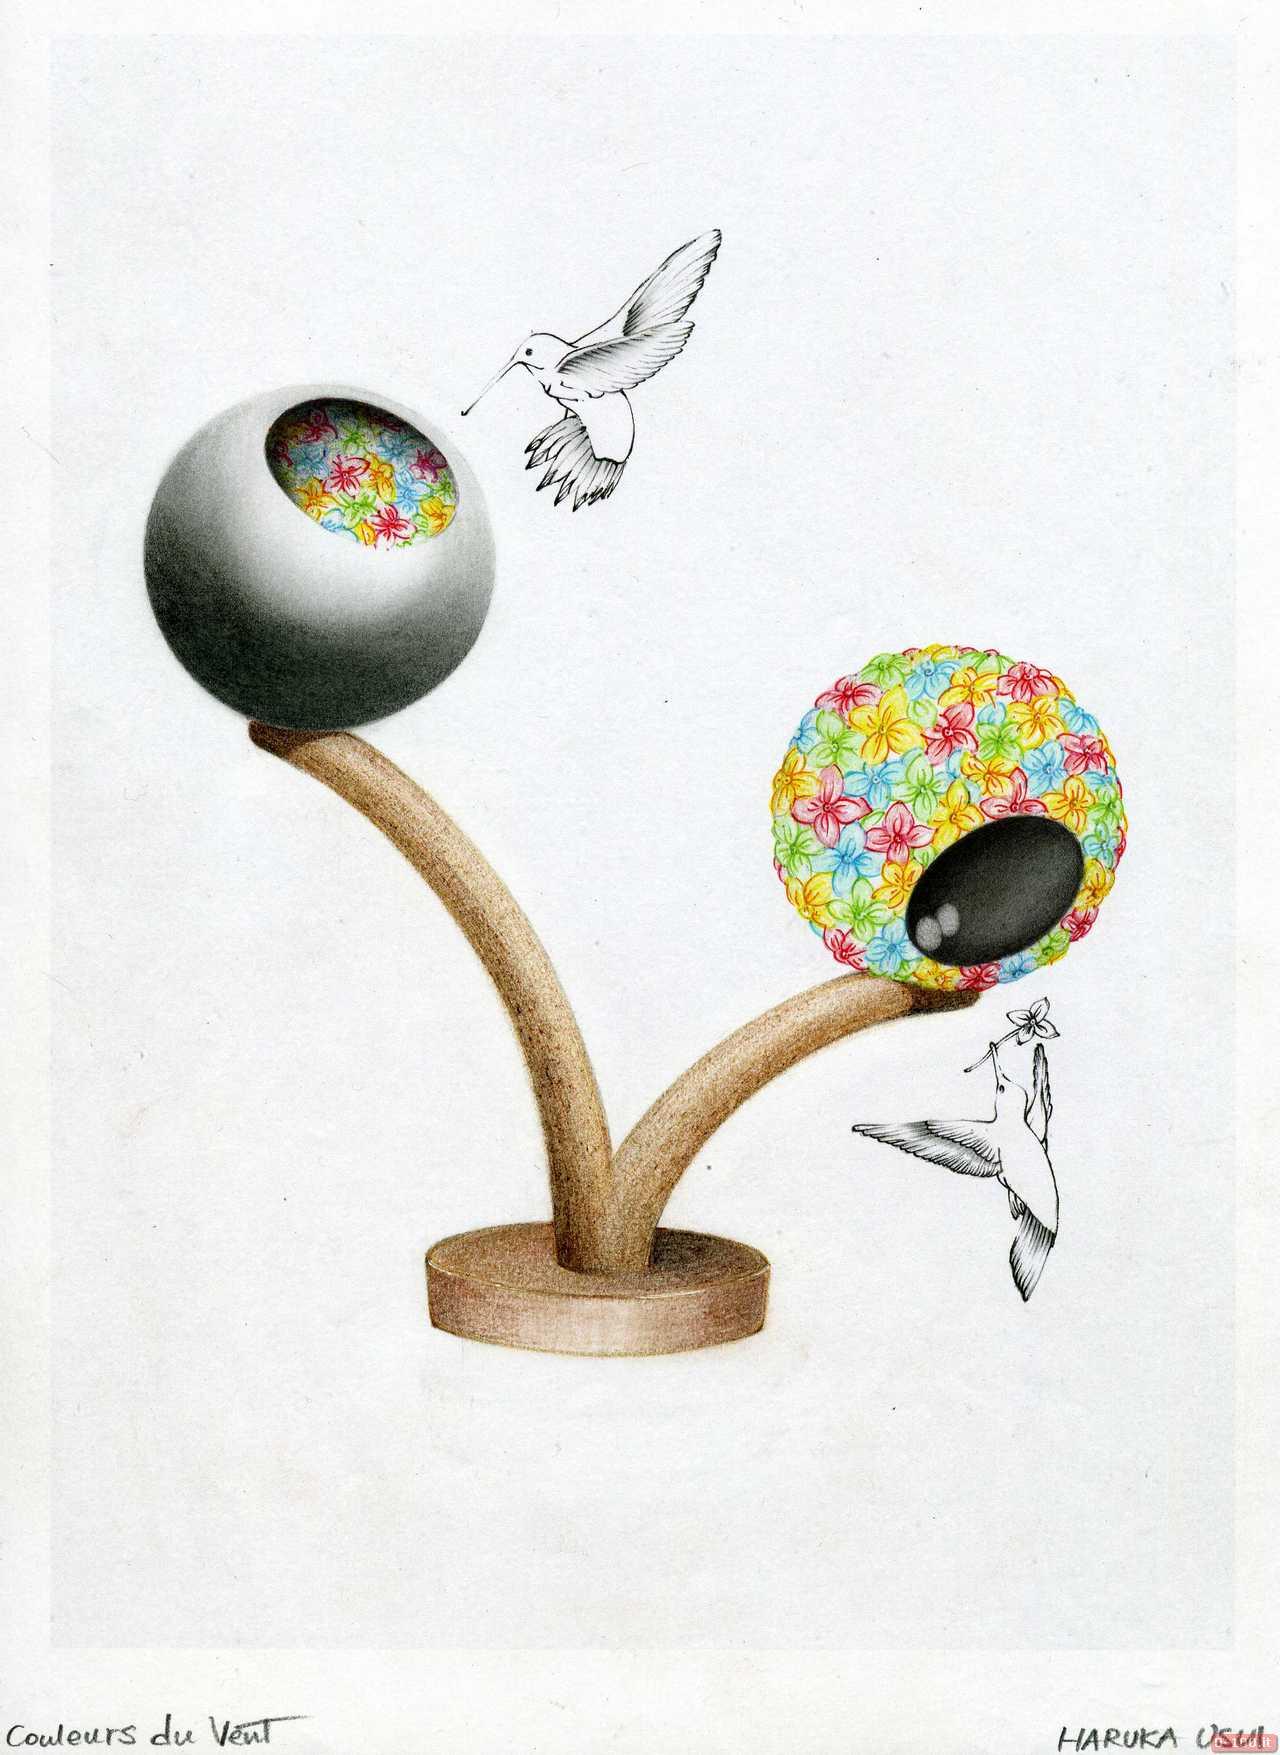 Blooming Creativity_Couleurs Du Vent e Les Bras Ouverts - Haruka Usui_Cleef & Arpels_0-100 2